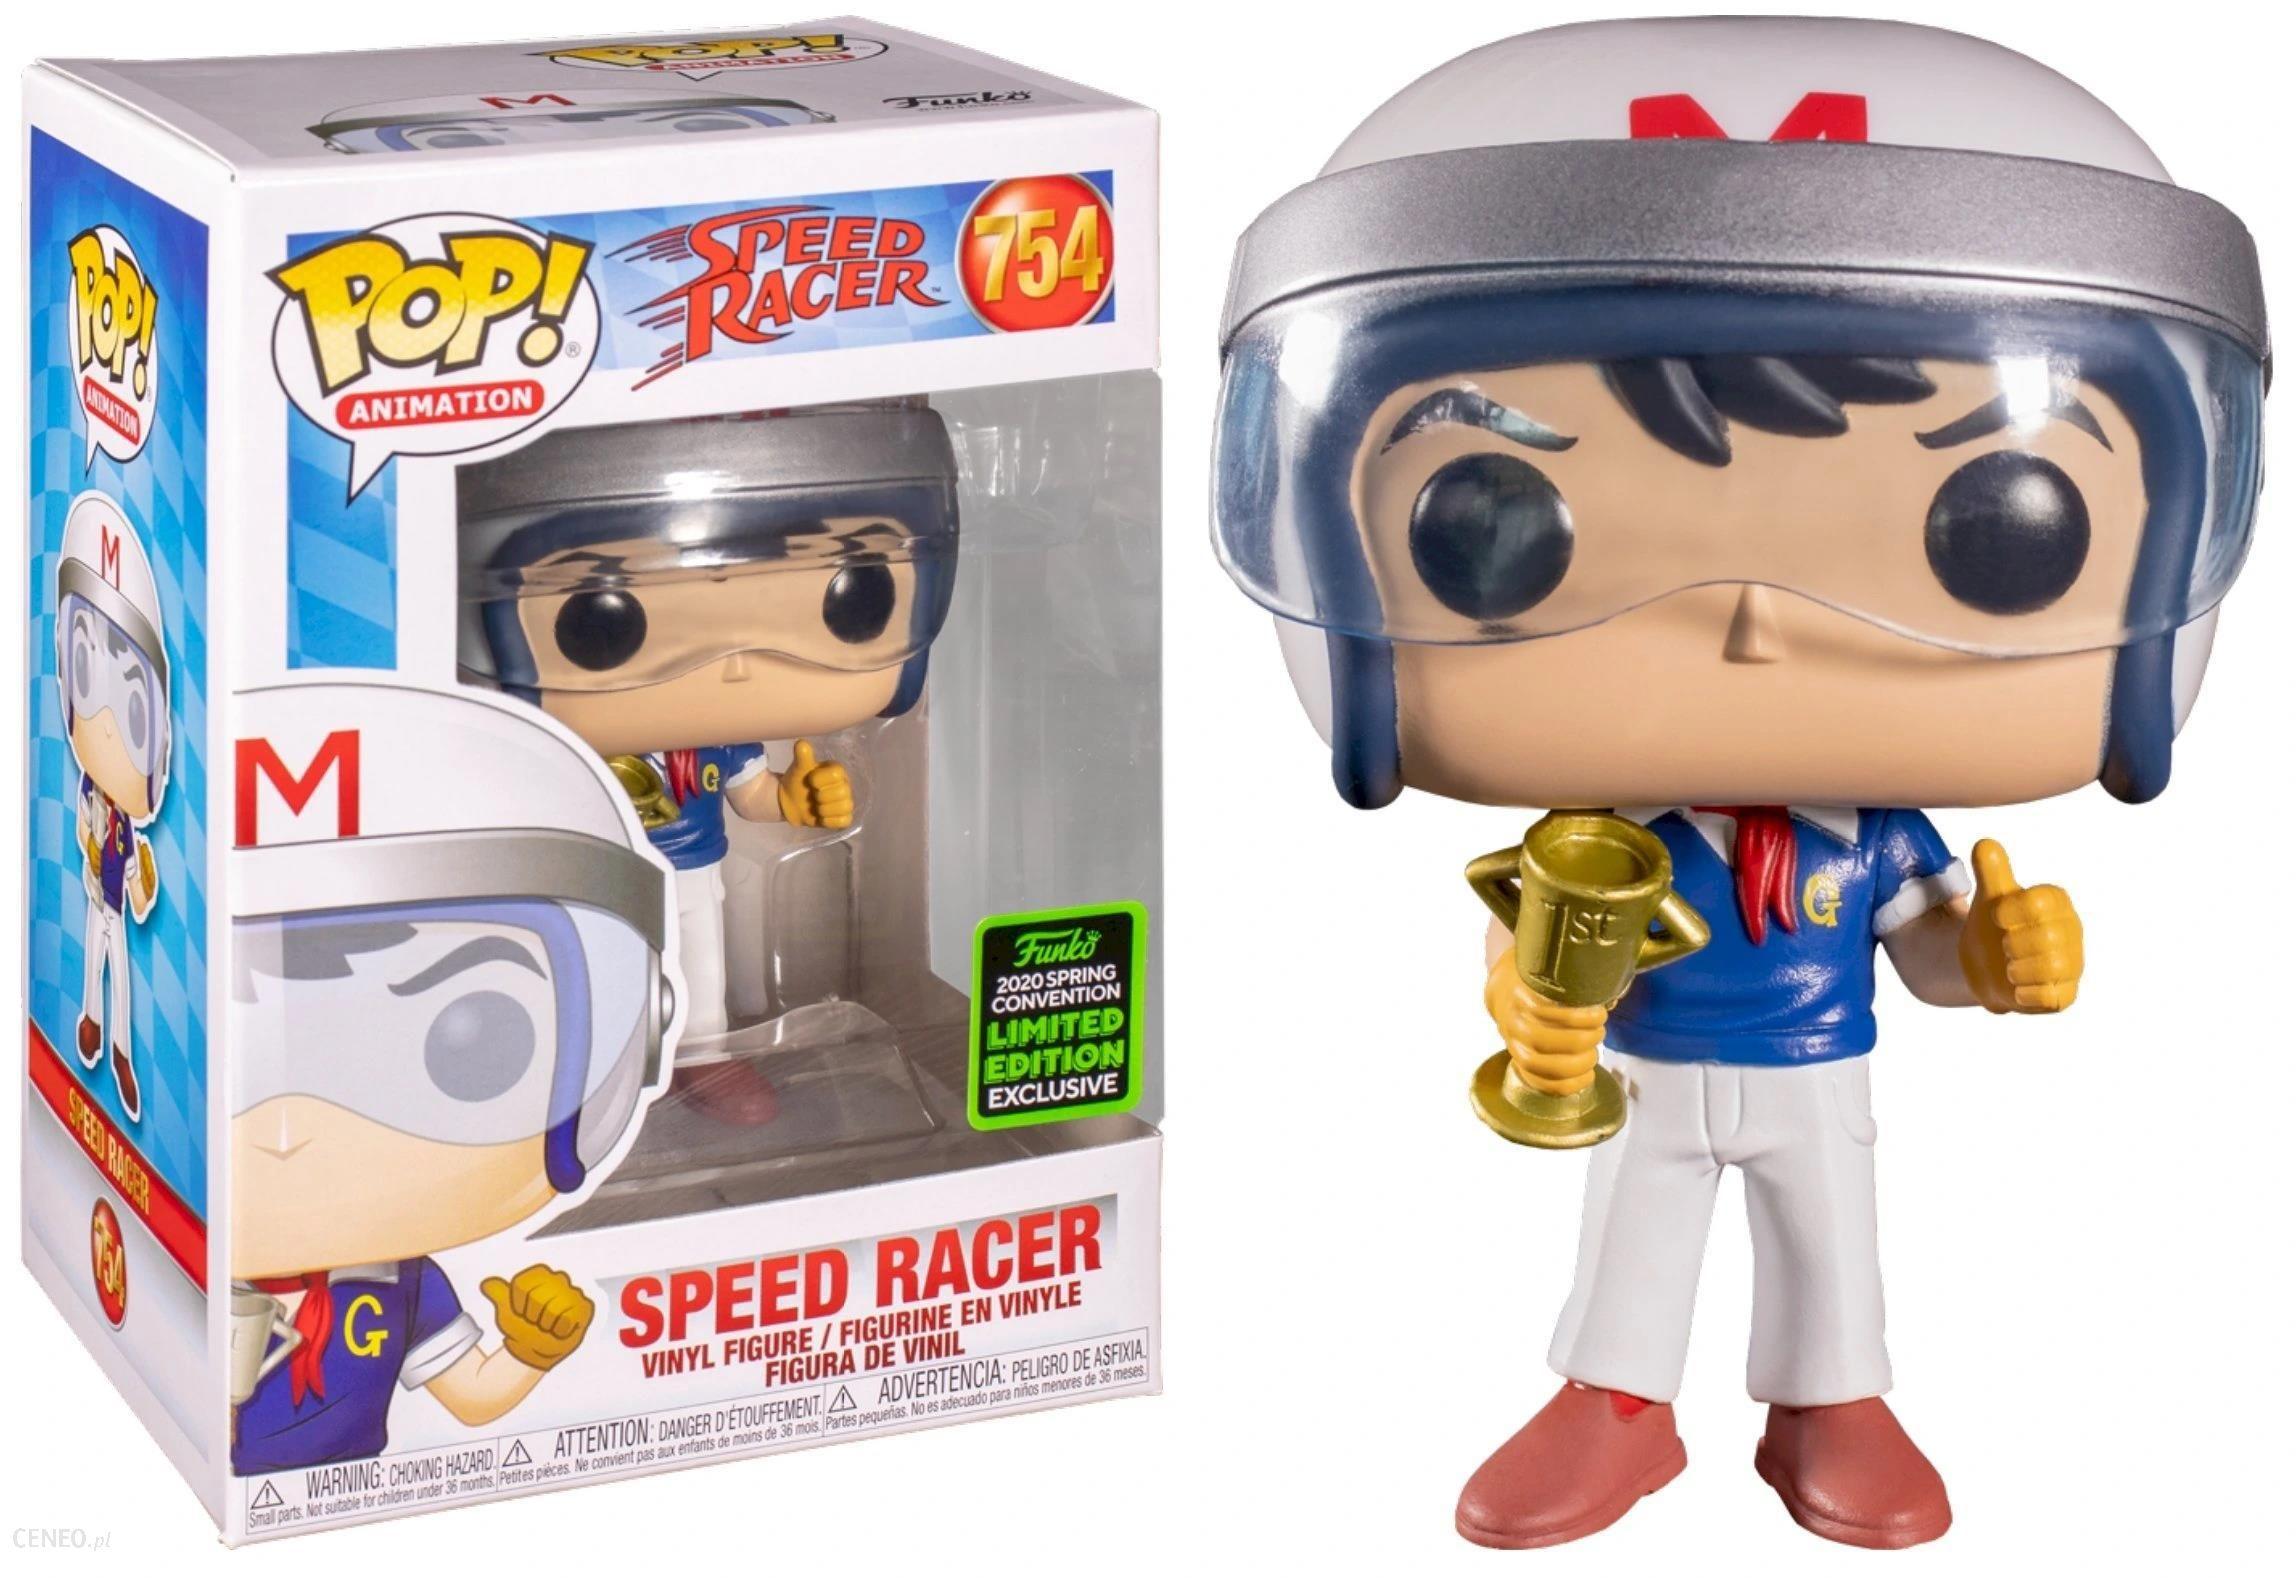 Funko Pop! Pop Speed Racer 754